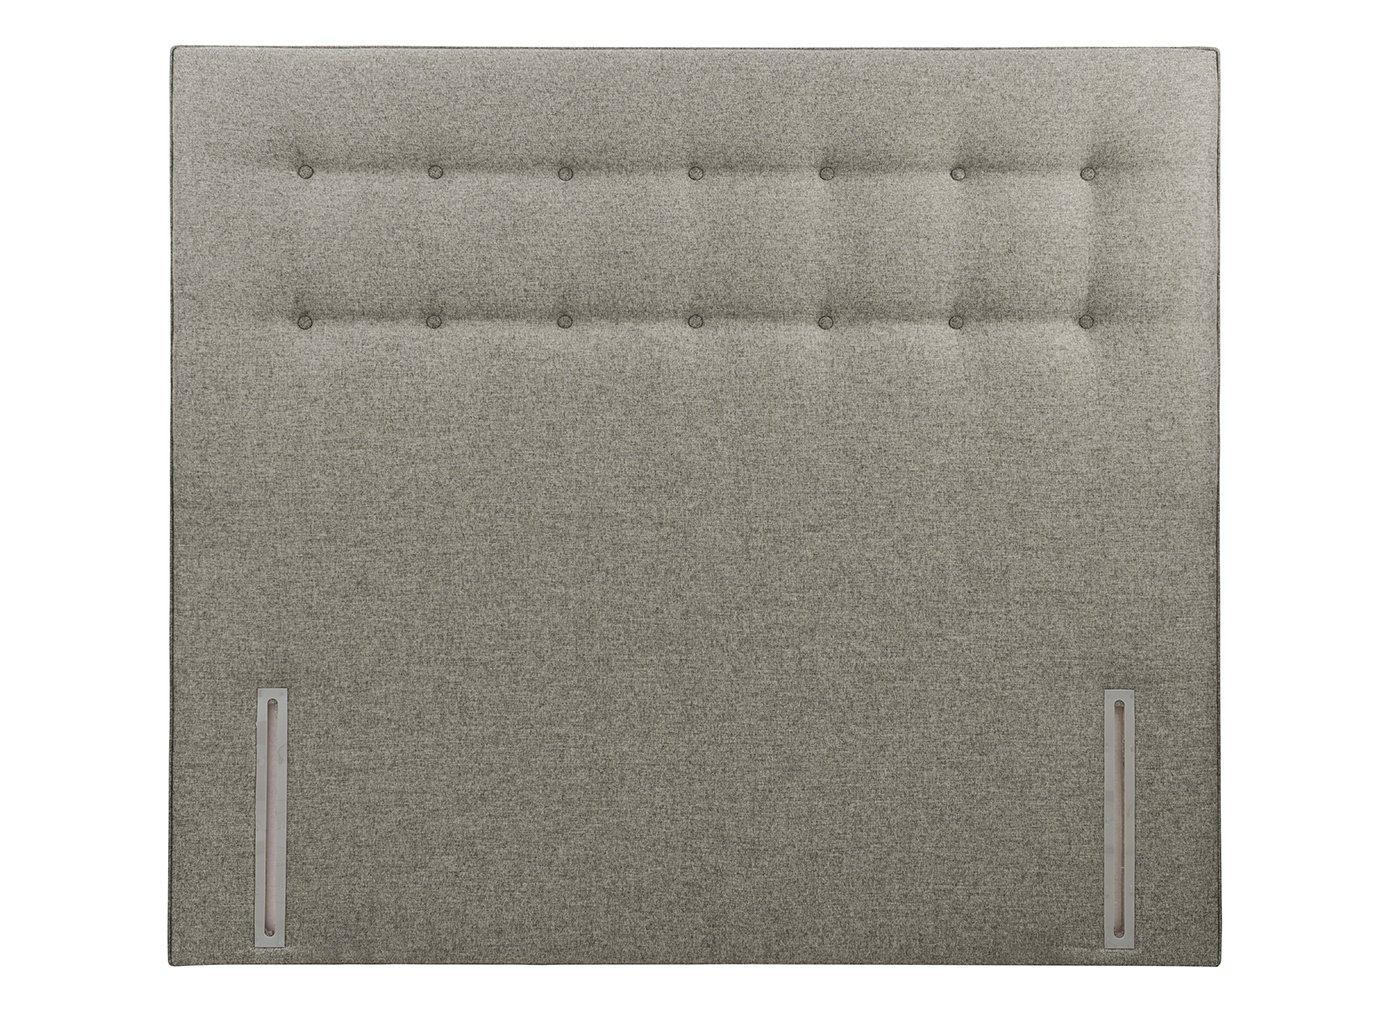 Silentnight Marigold 4'0 H/B Marl Grey (Enhanced Fabric) 4'0 Small double